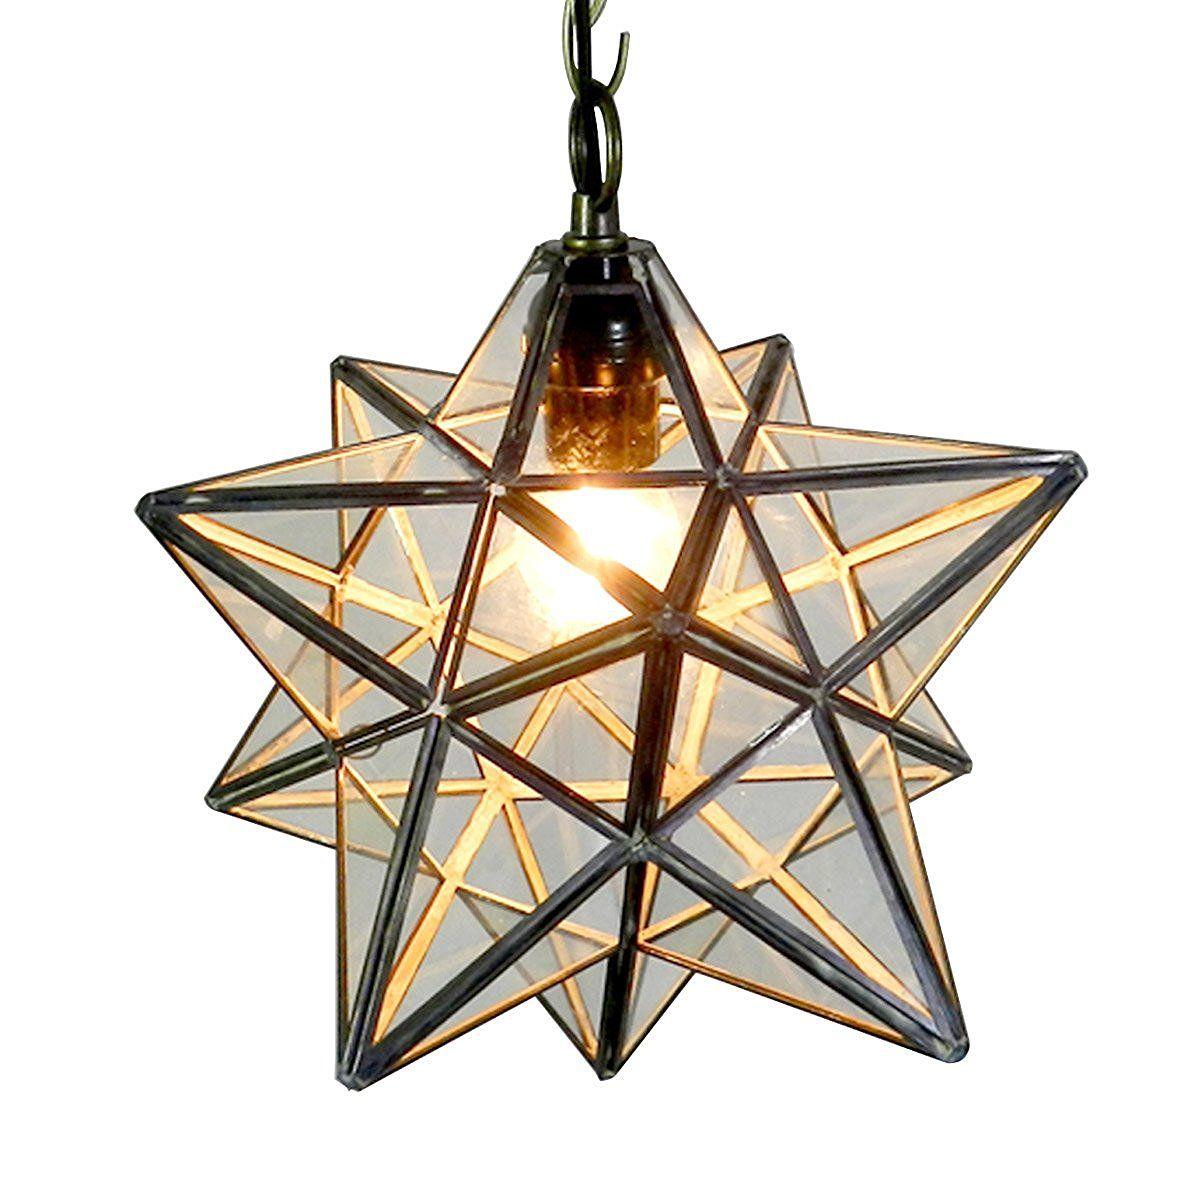 Homestia Rural Pentagram Stereo Star Drop Pendant Light Crystal Transparent Glass Ceiling Lamp Amazon Co Uk Lighting Star Lights On Ceiling Ceiling Lights Ceiling Lamp